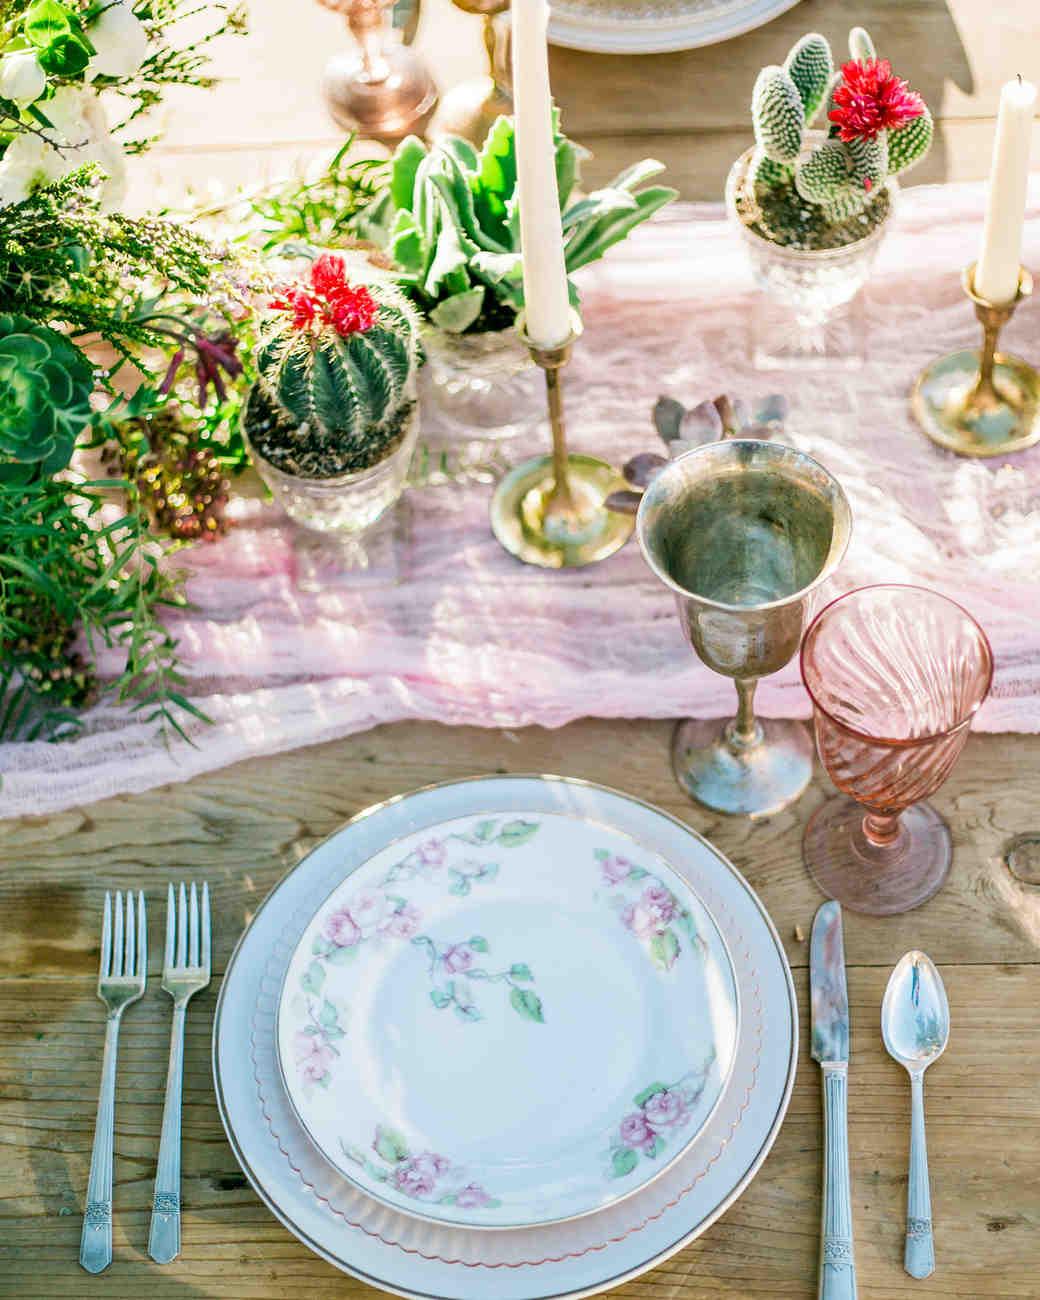 Rustic Tabletop with Mini Cactus Centerpieces